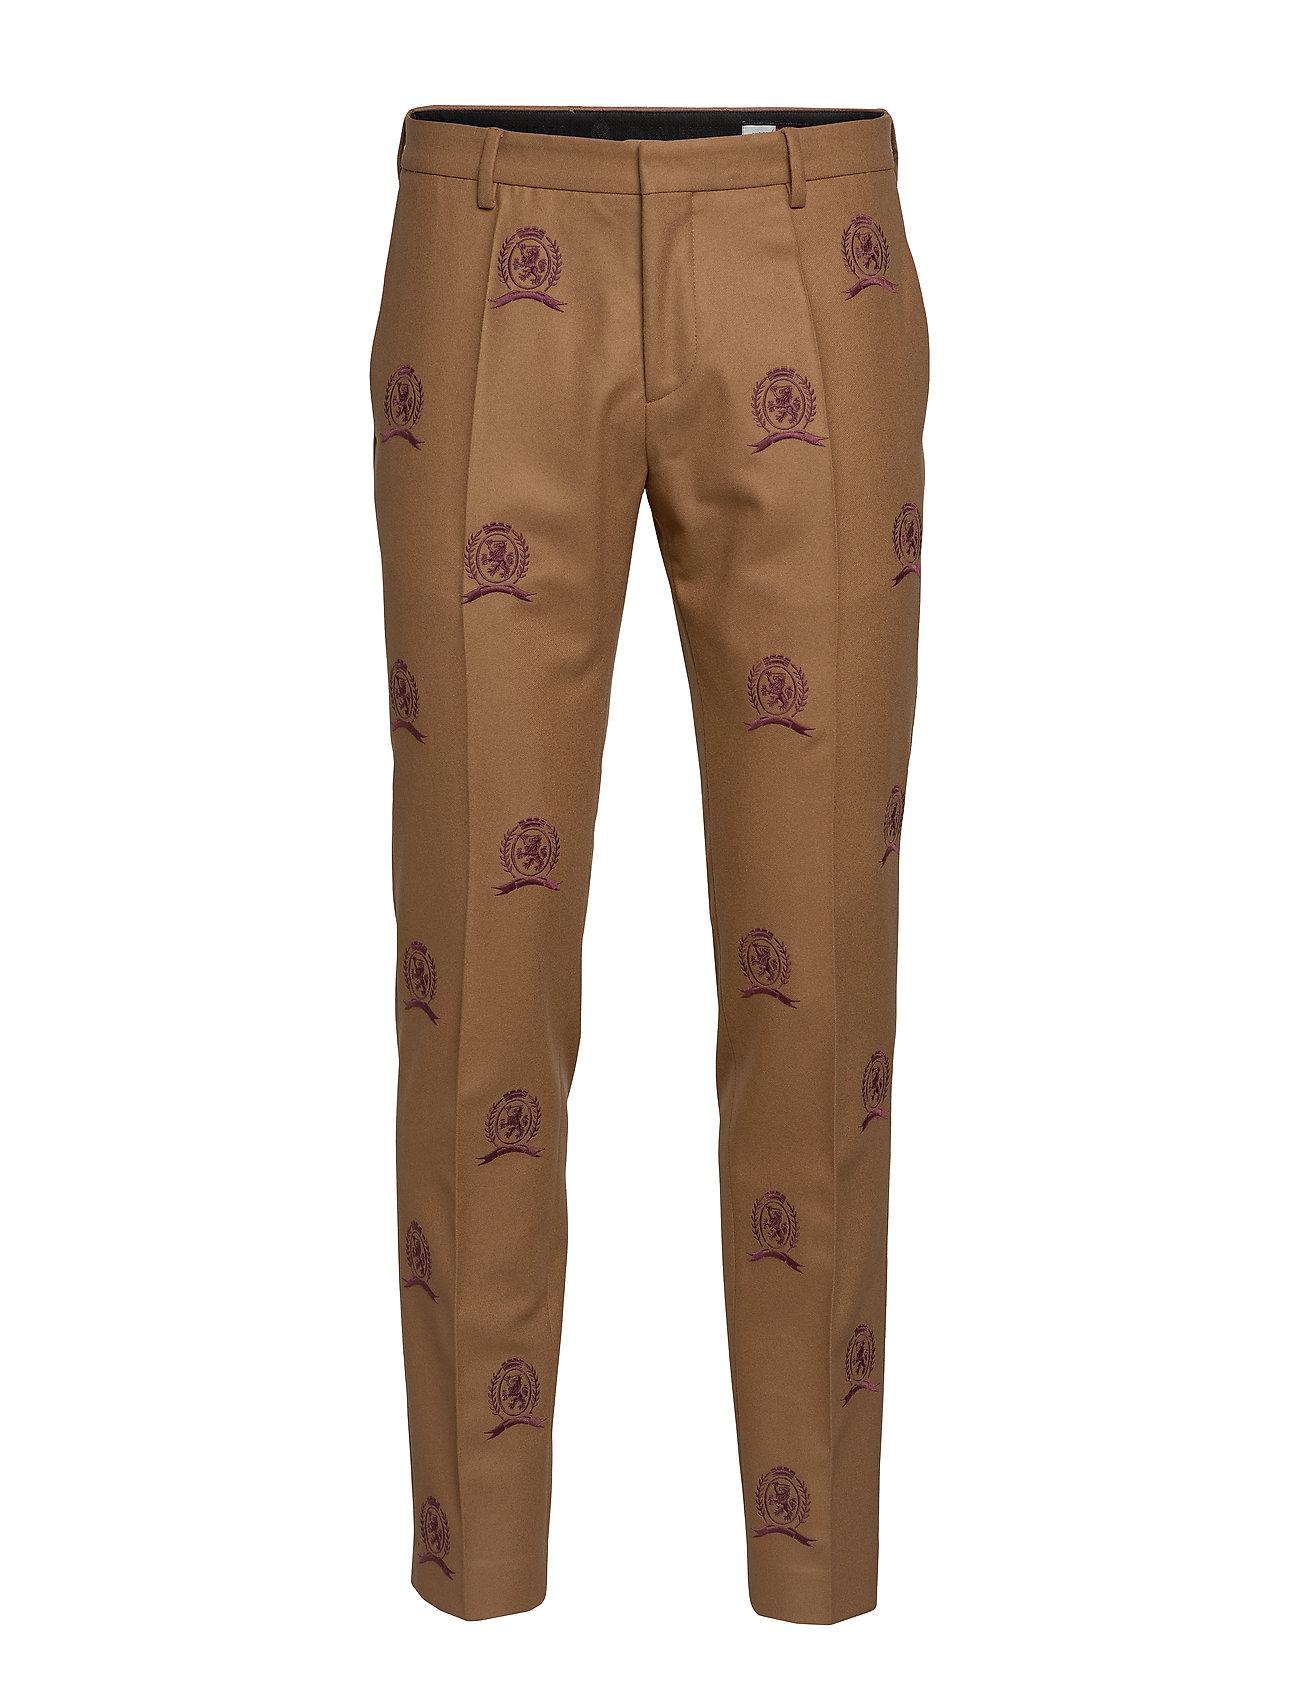 Image of Hcm Suit Sep Pants Embroidery Habitbukser Stylede Bukser Beige Hilfiger Collection (3406228335)